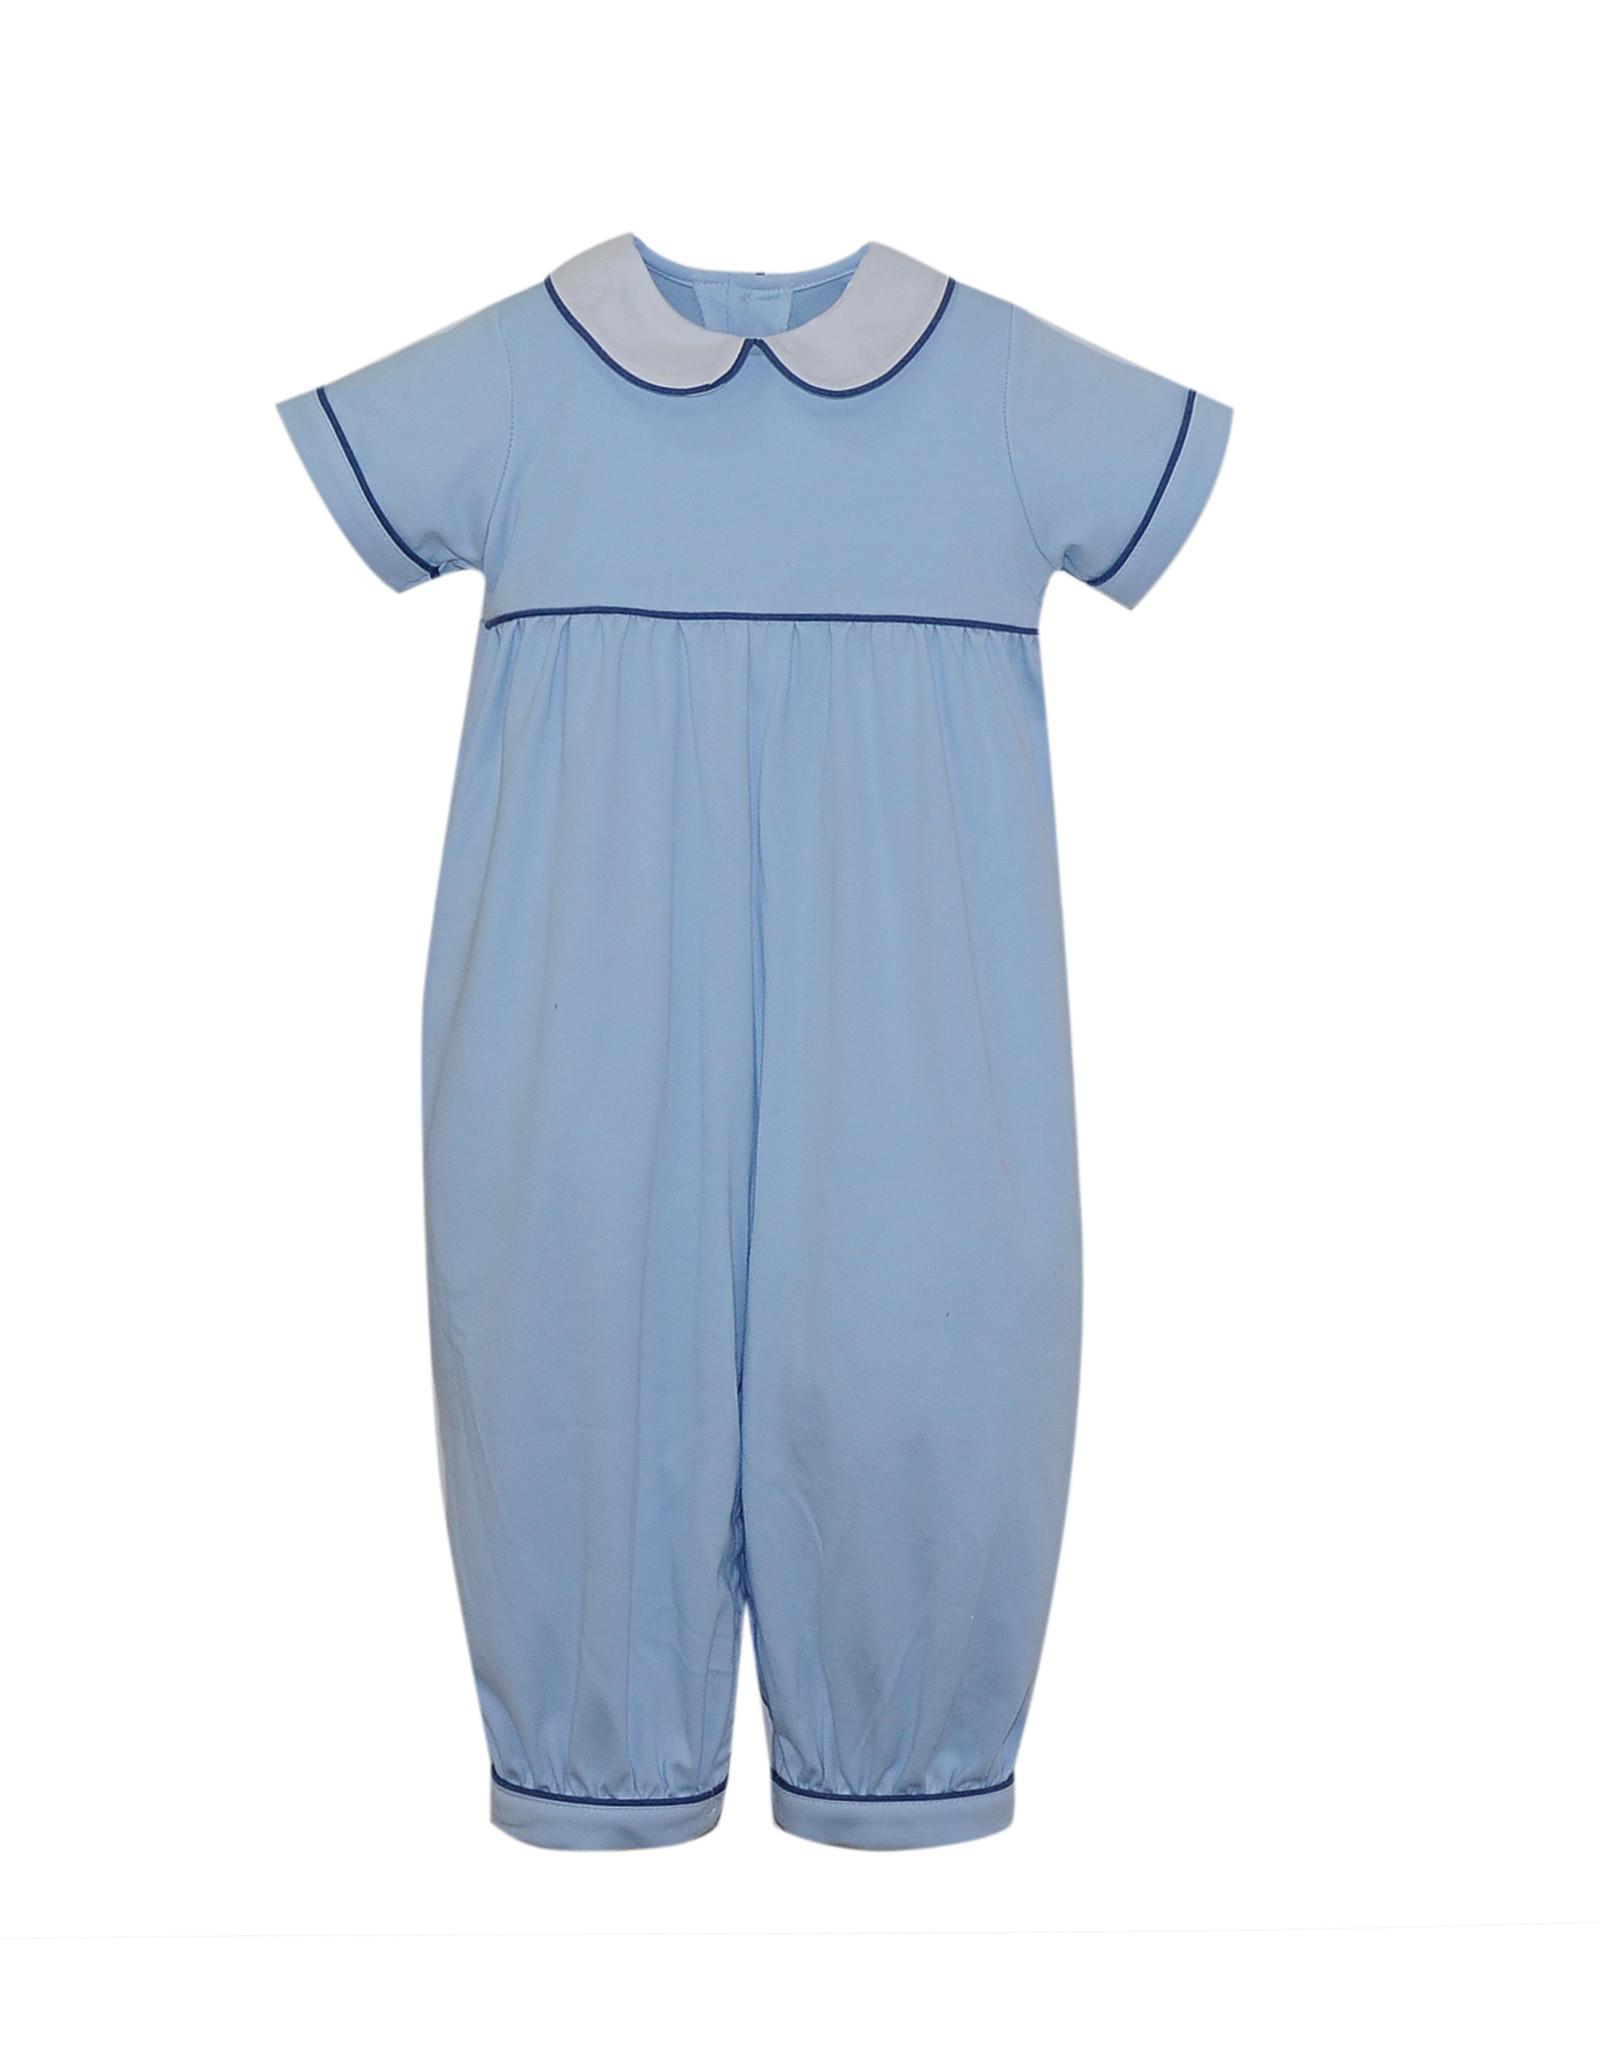 LullabySet Light Blue Knit Rover Romper